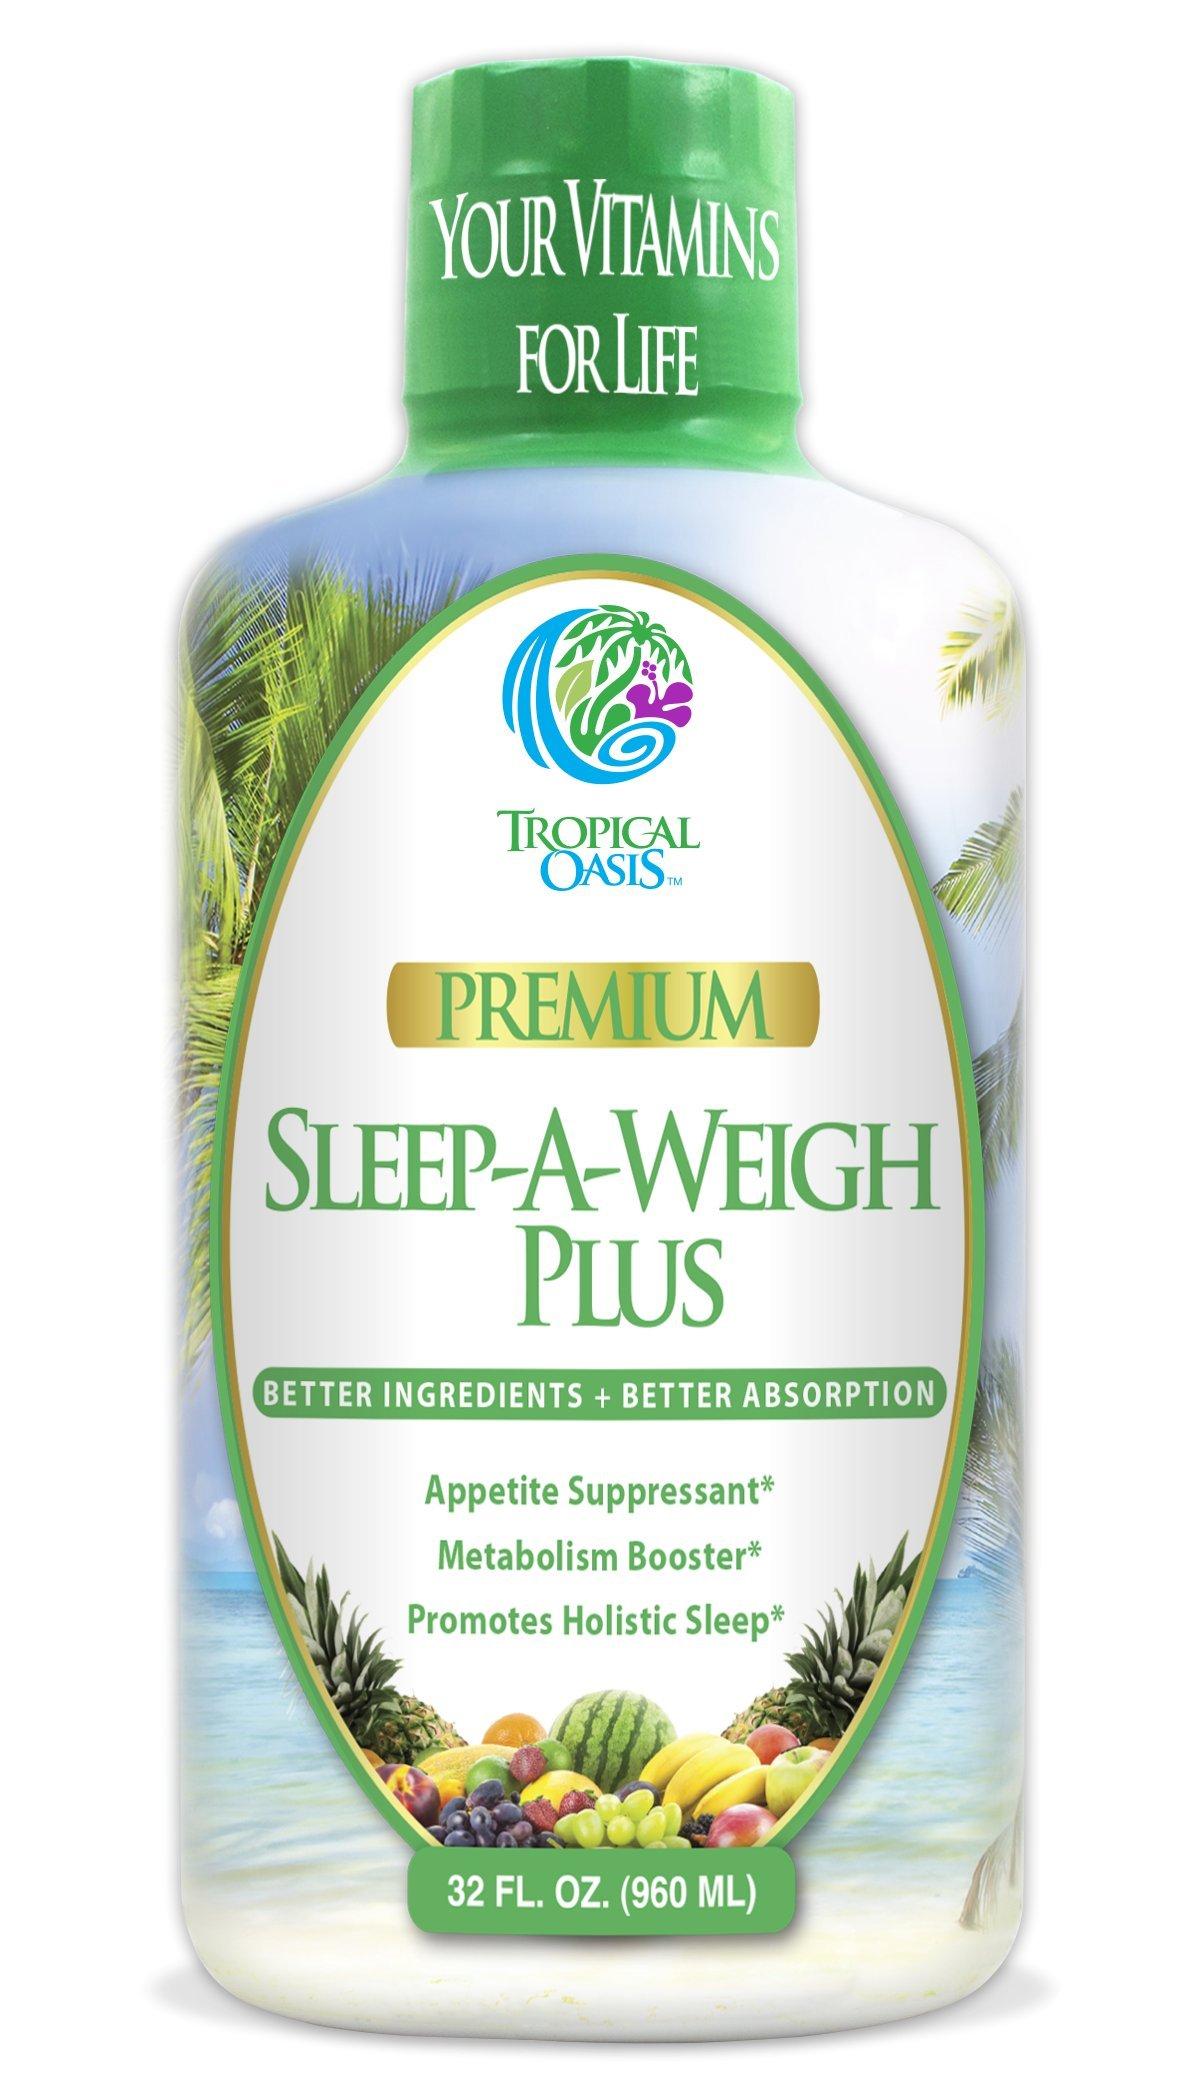 Sleep-A-Weigh Plus w/ Liquid Collagen - Natural Weight loss & Sleeping Aid - 32oz, 32 serv by Tropical Oasis